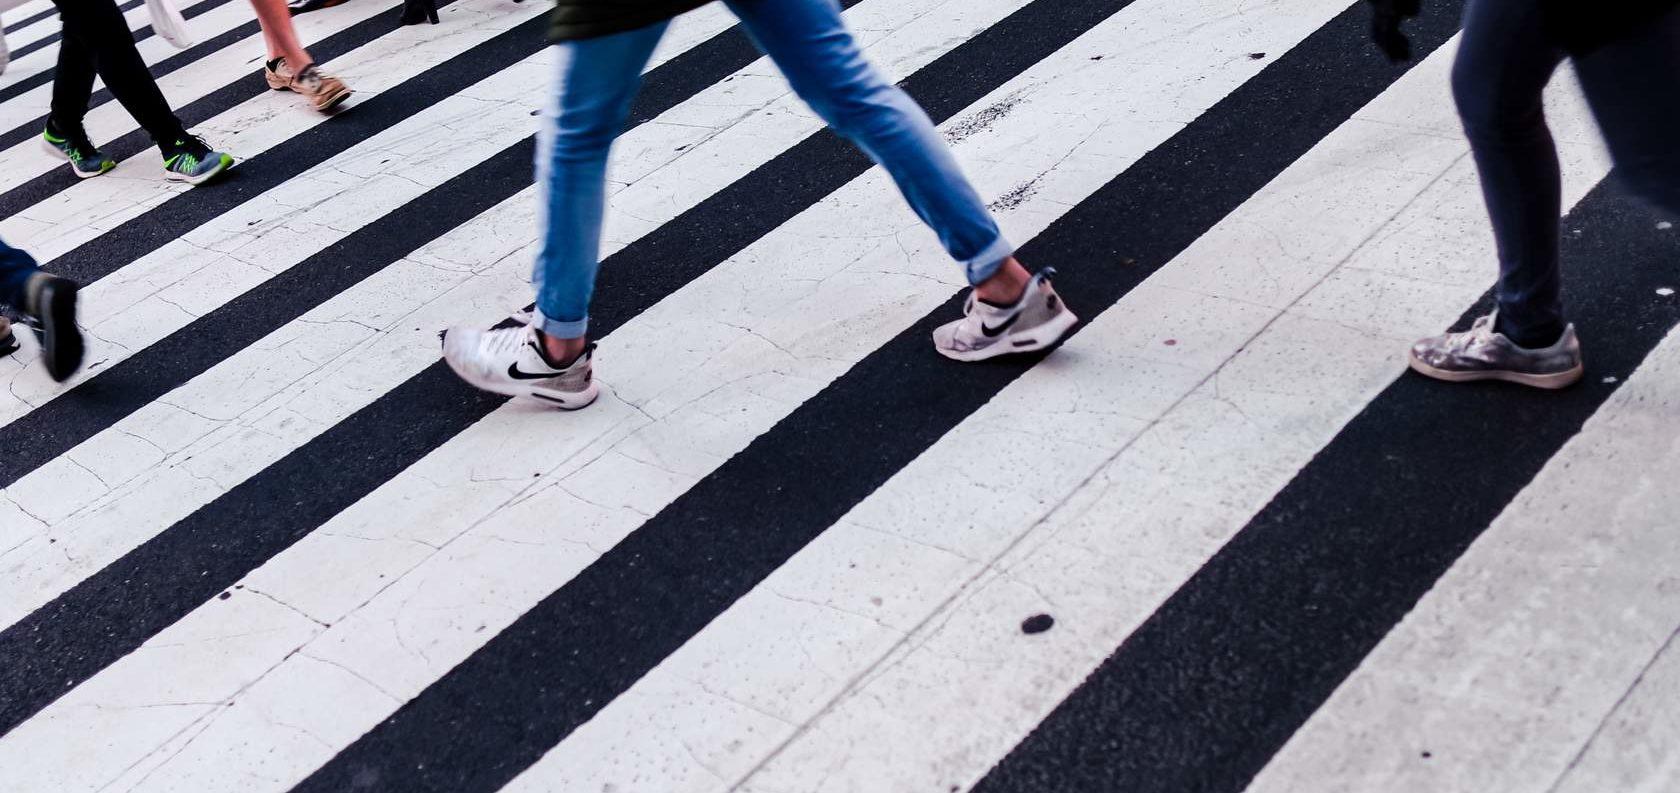 The feet of people walking through a crosswalk